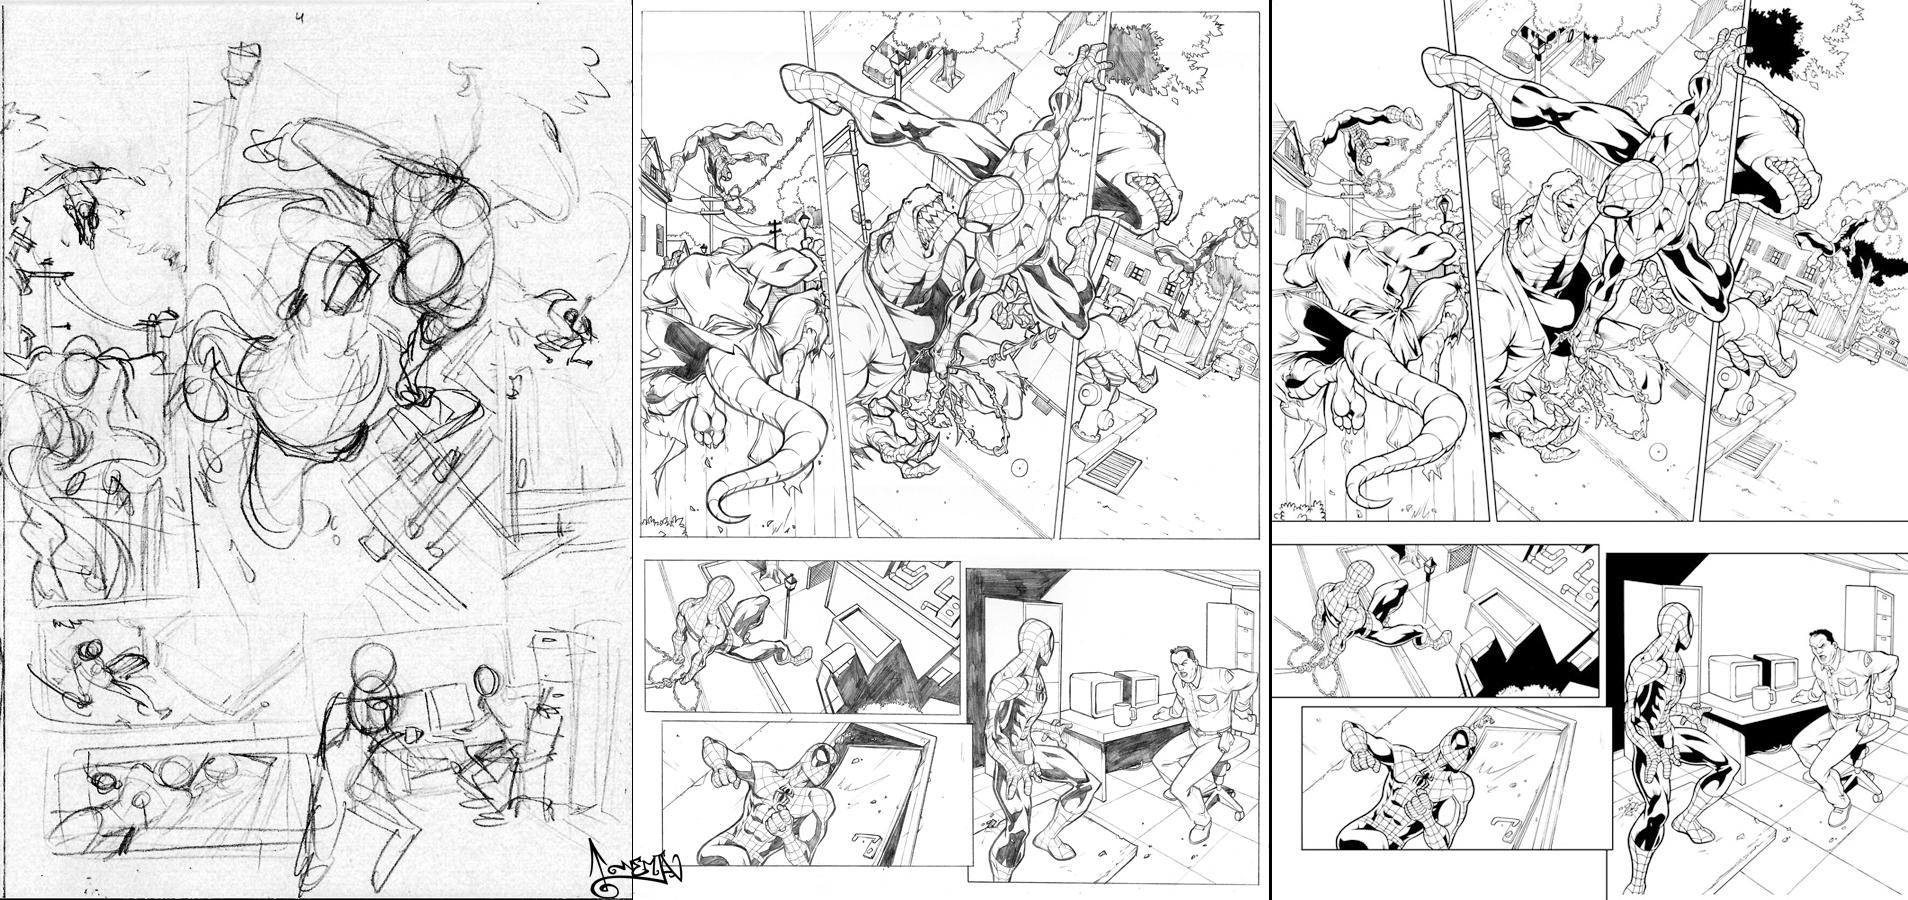 Marvel Heroes 2 Spider-Man p.4 by CarlosGomezArtist